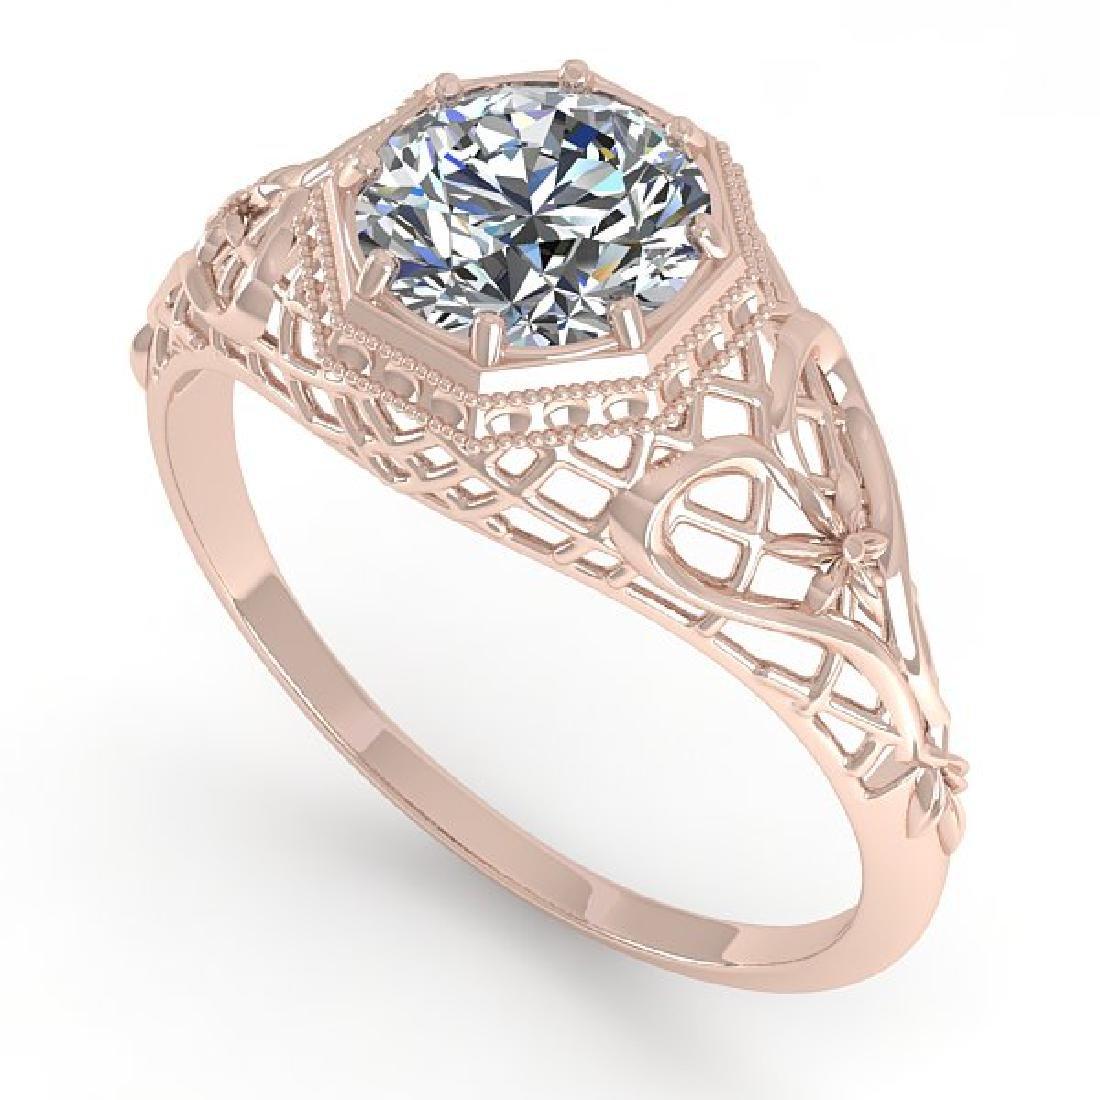 1.0 CTW VS/SI Diamond Solitaire Ring 14K Rose Gold - 2